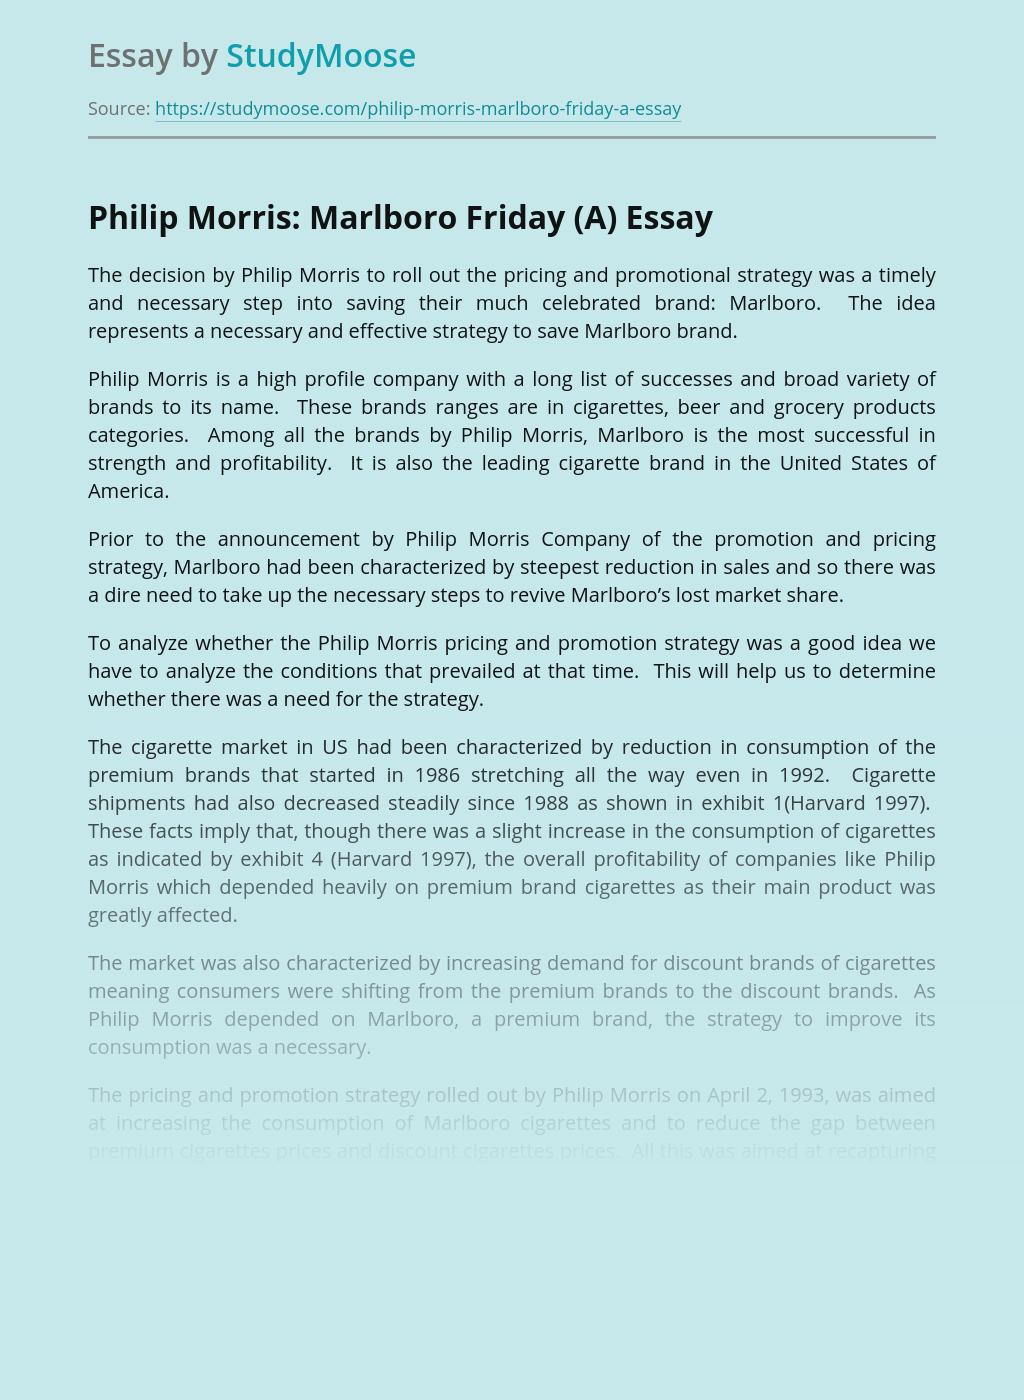 Philip Morris: Marlboro Friday (A)